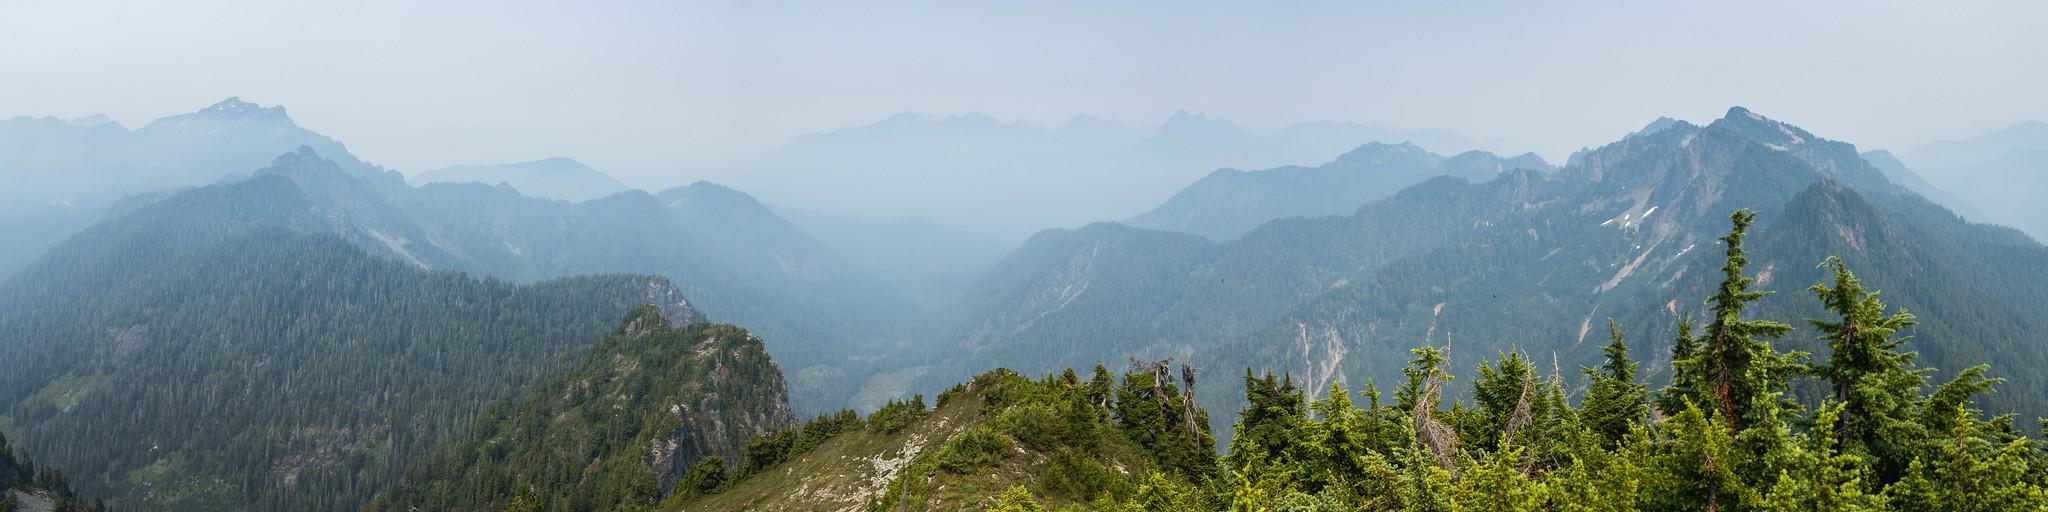 Mount Index to Mount Rudderham panoramic view